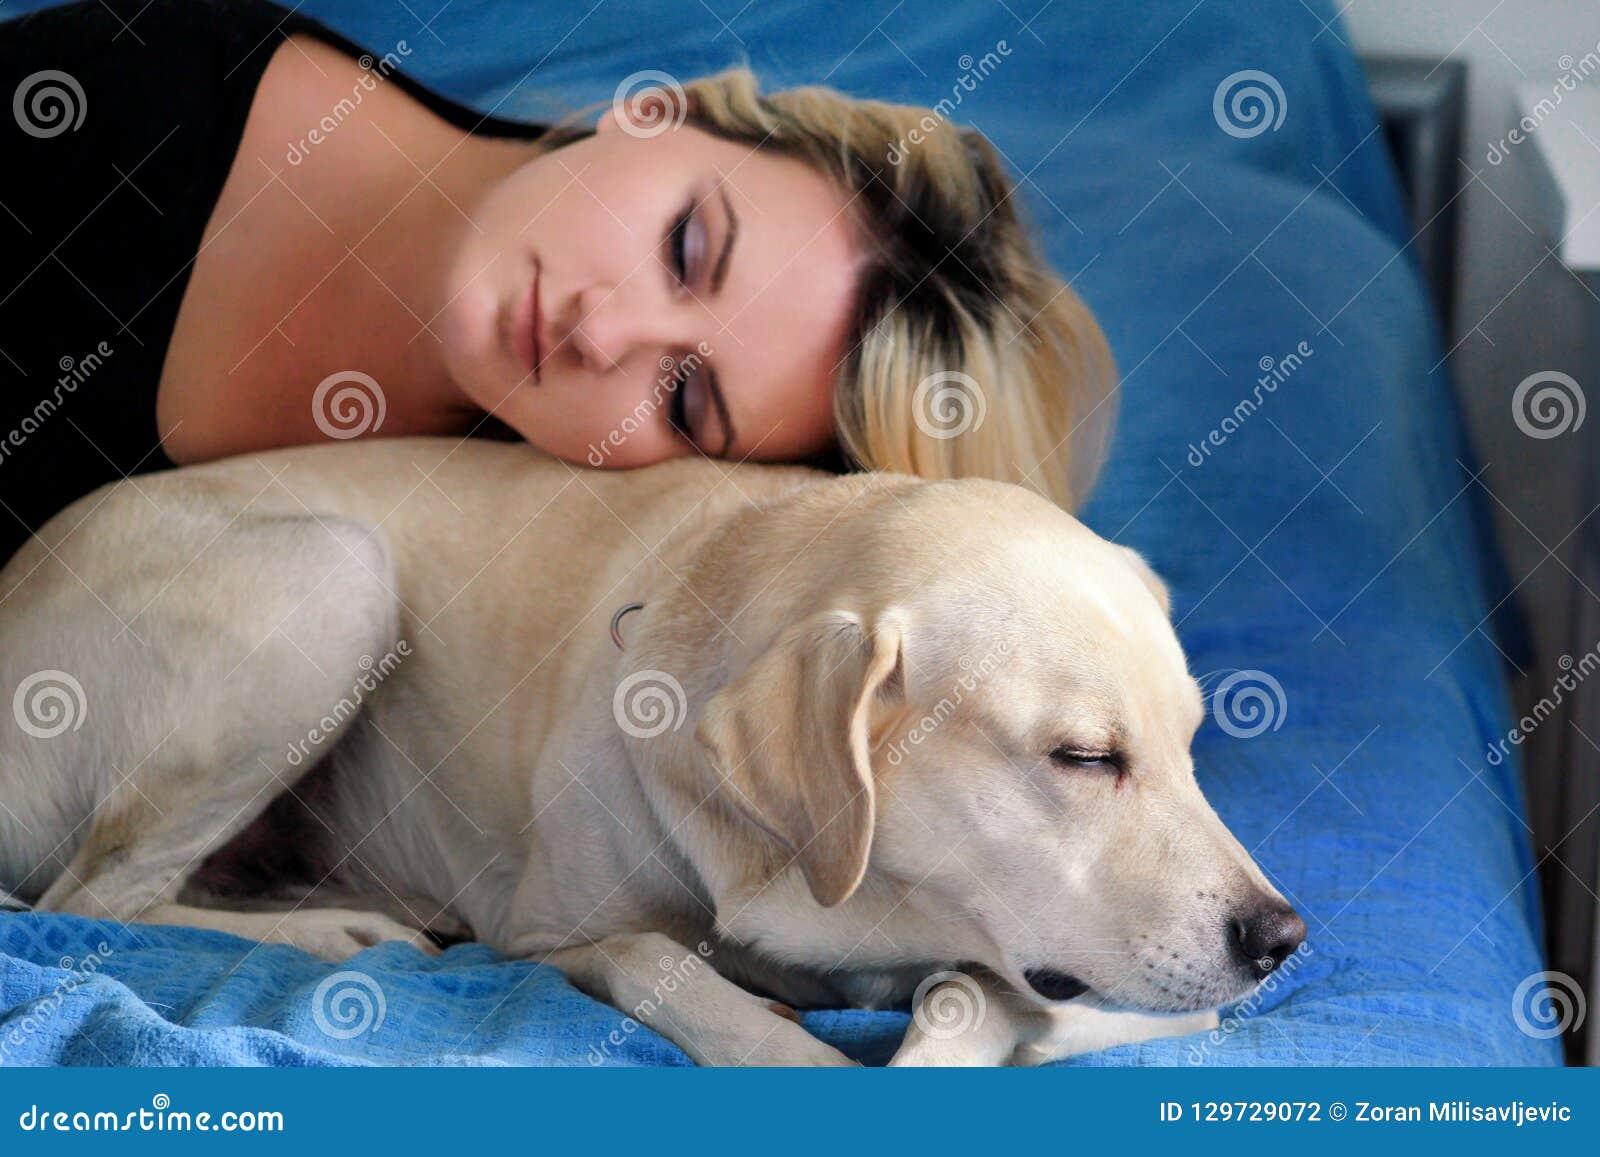 Vrouw met leuke honden thuis Knap meisje die en met haar hond in bed in slaapkamer rusten slapen Eigenaar en hondslaap in bank